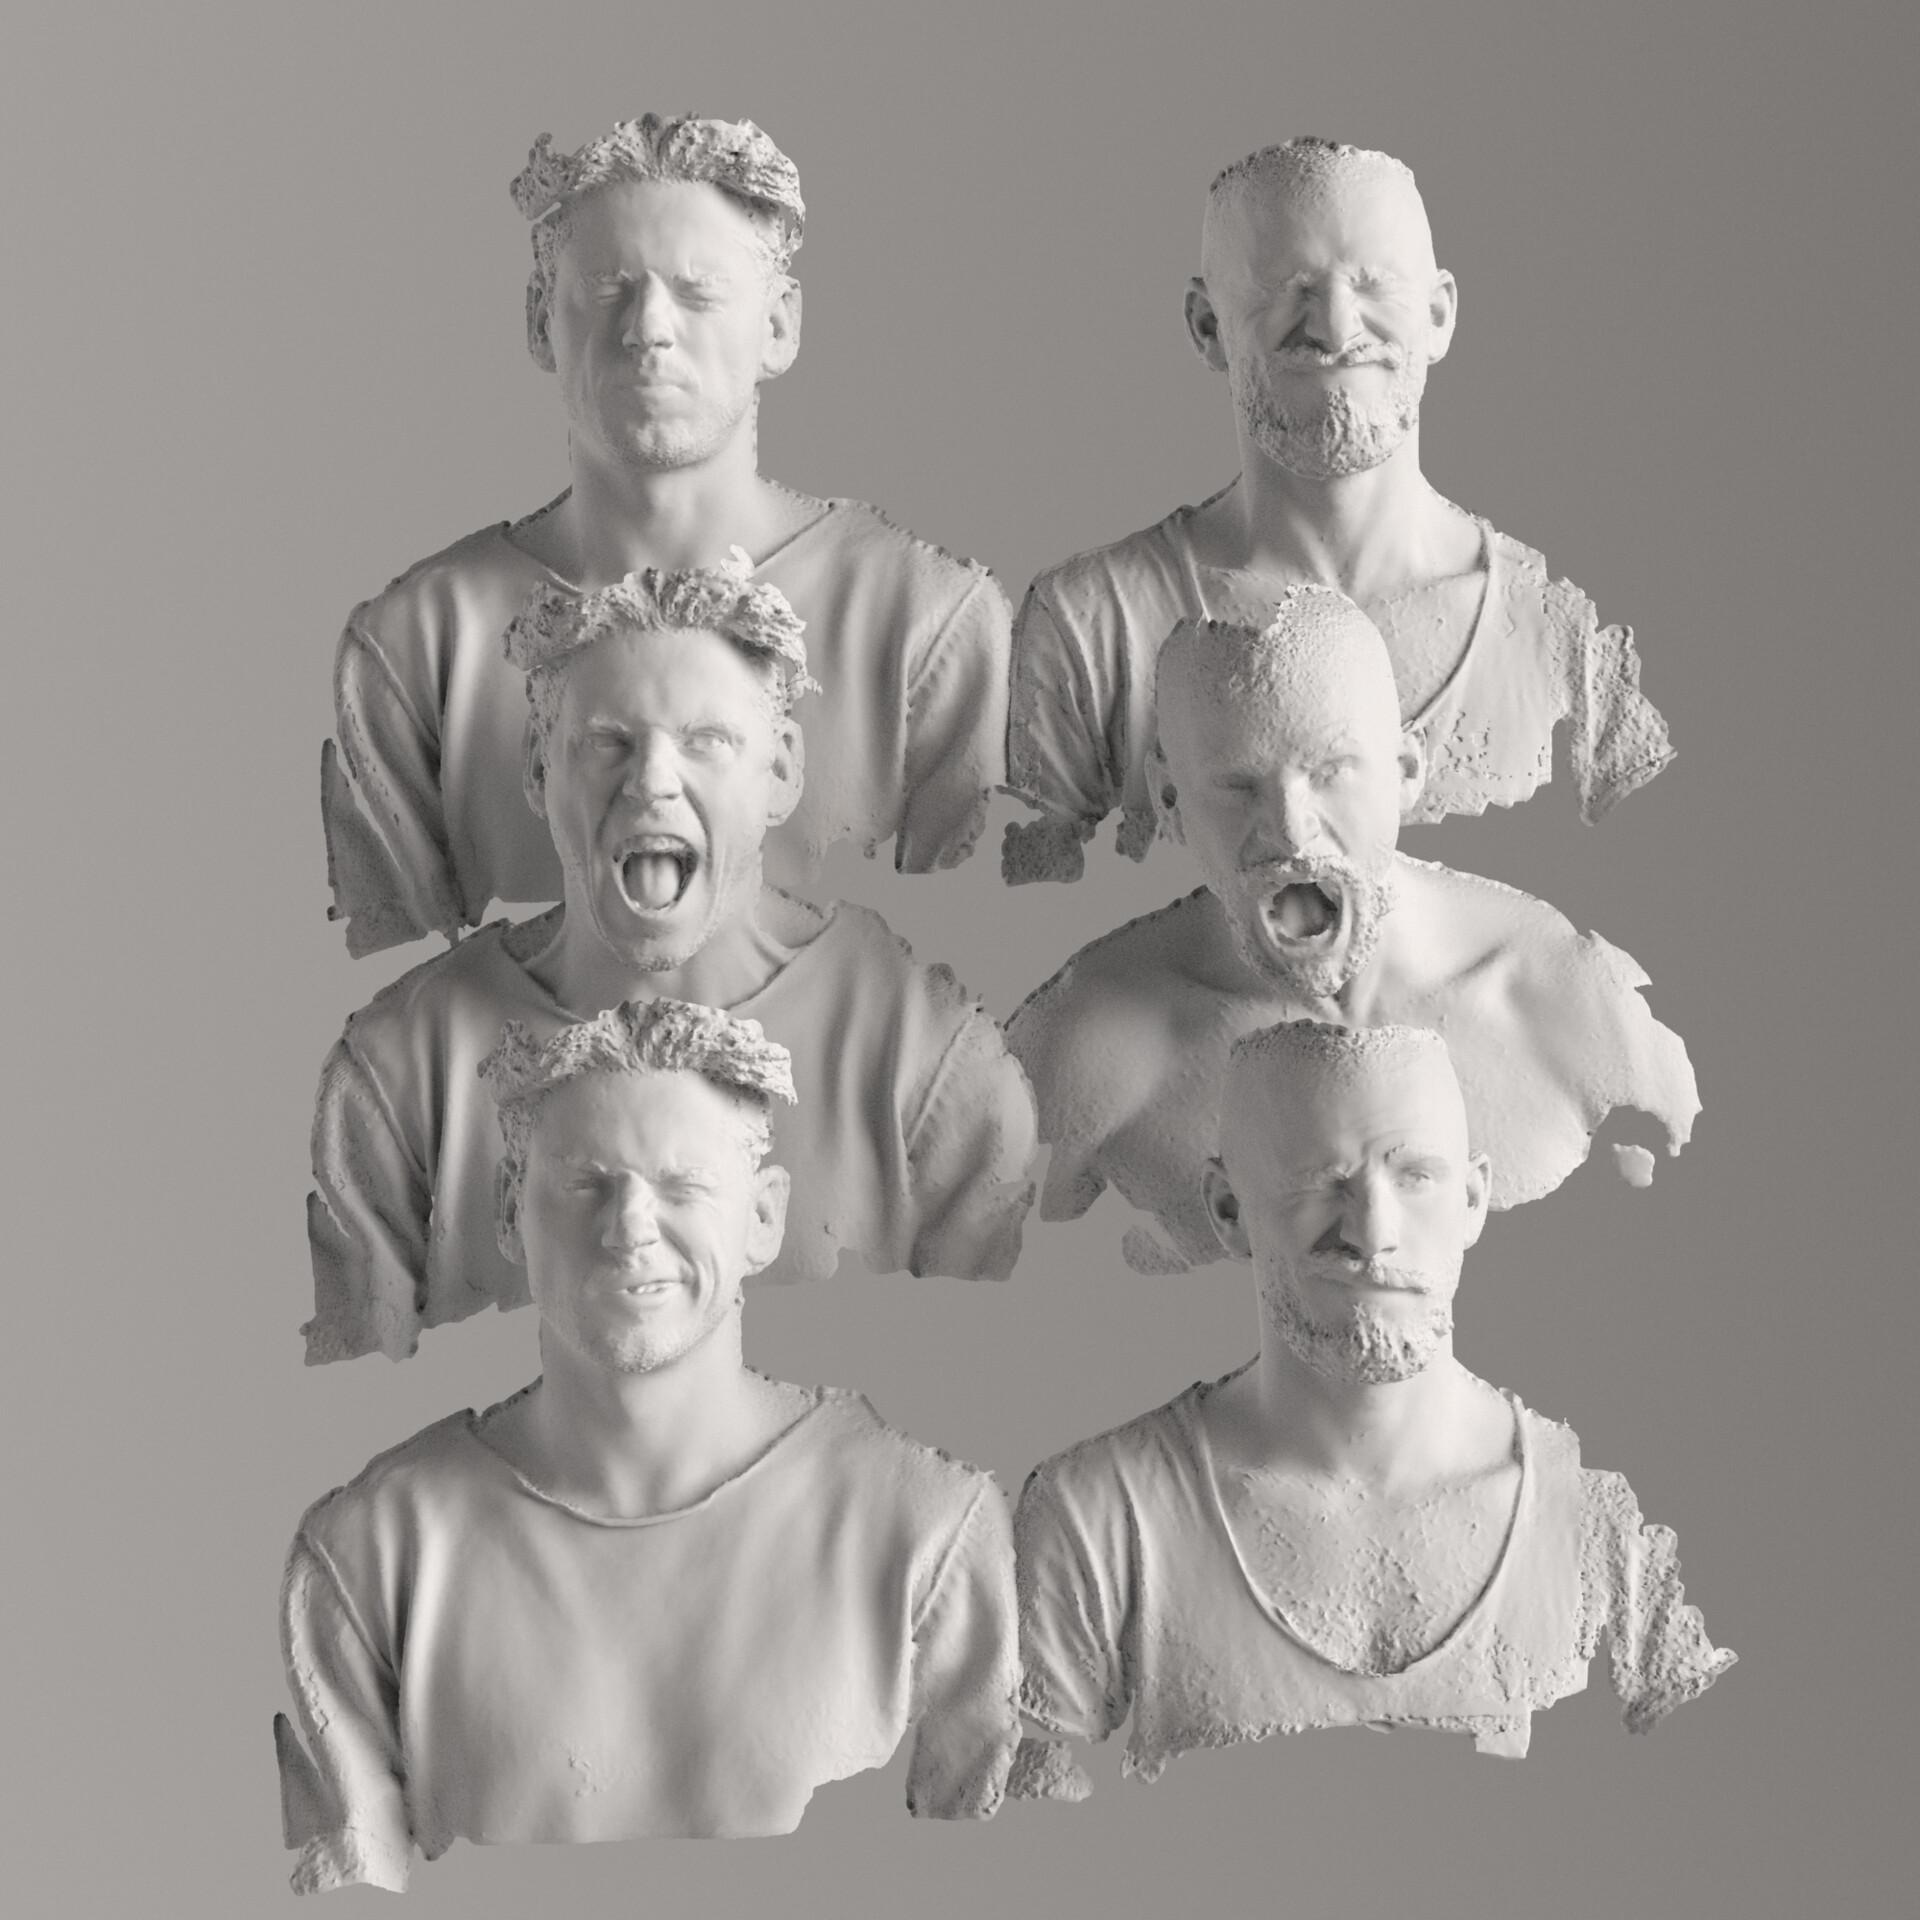 uncleaned facescans